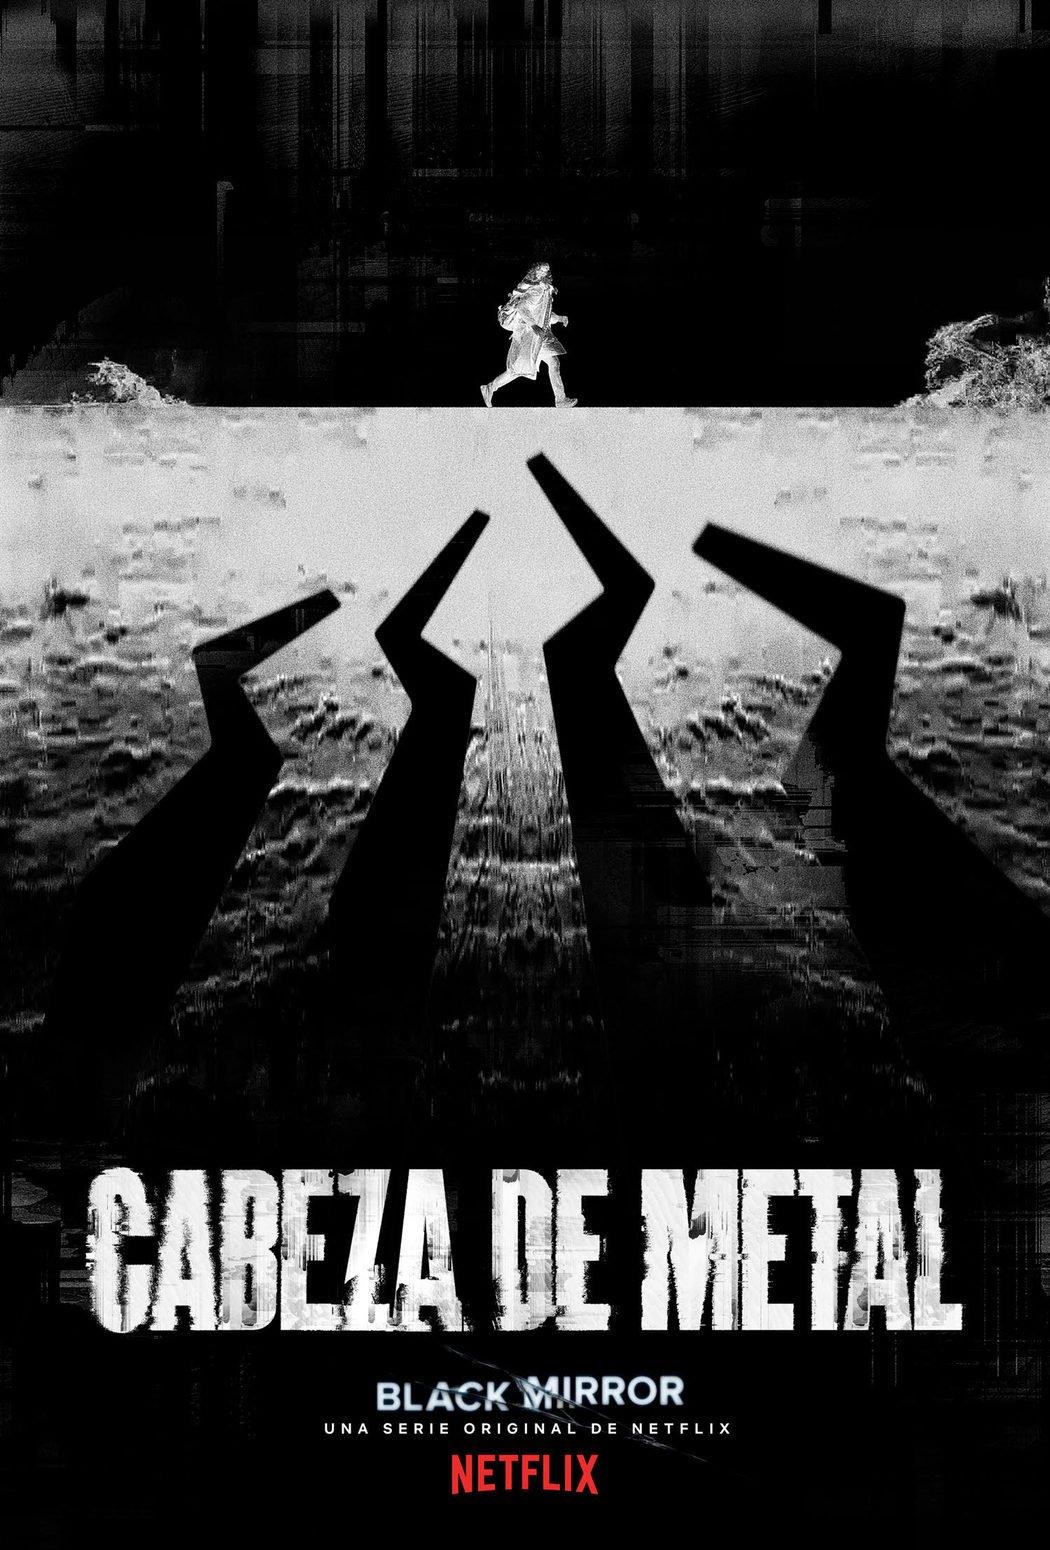 Cabeza de metal